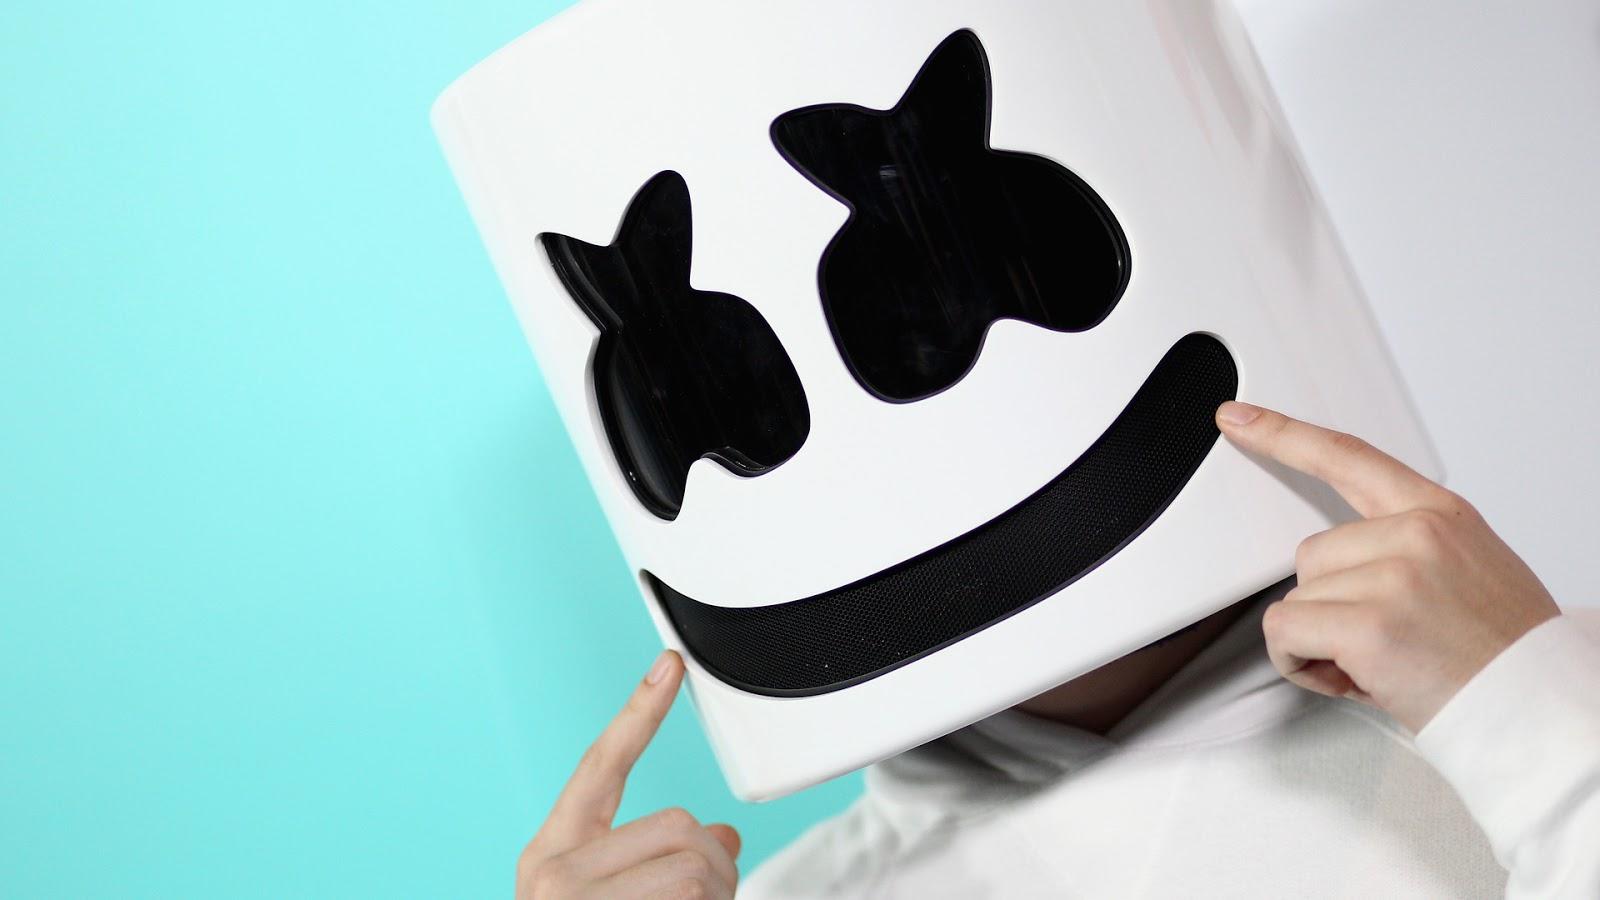 Marshmello Dj Wallpaper Hd Hd Wallpaper Iphone 3d Wallpaper Marshmello 1600x900 Wallpaper Teahub Io